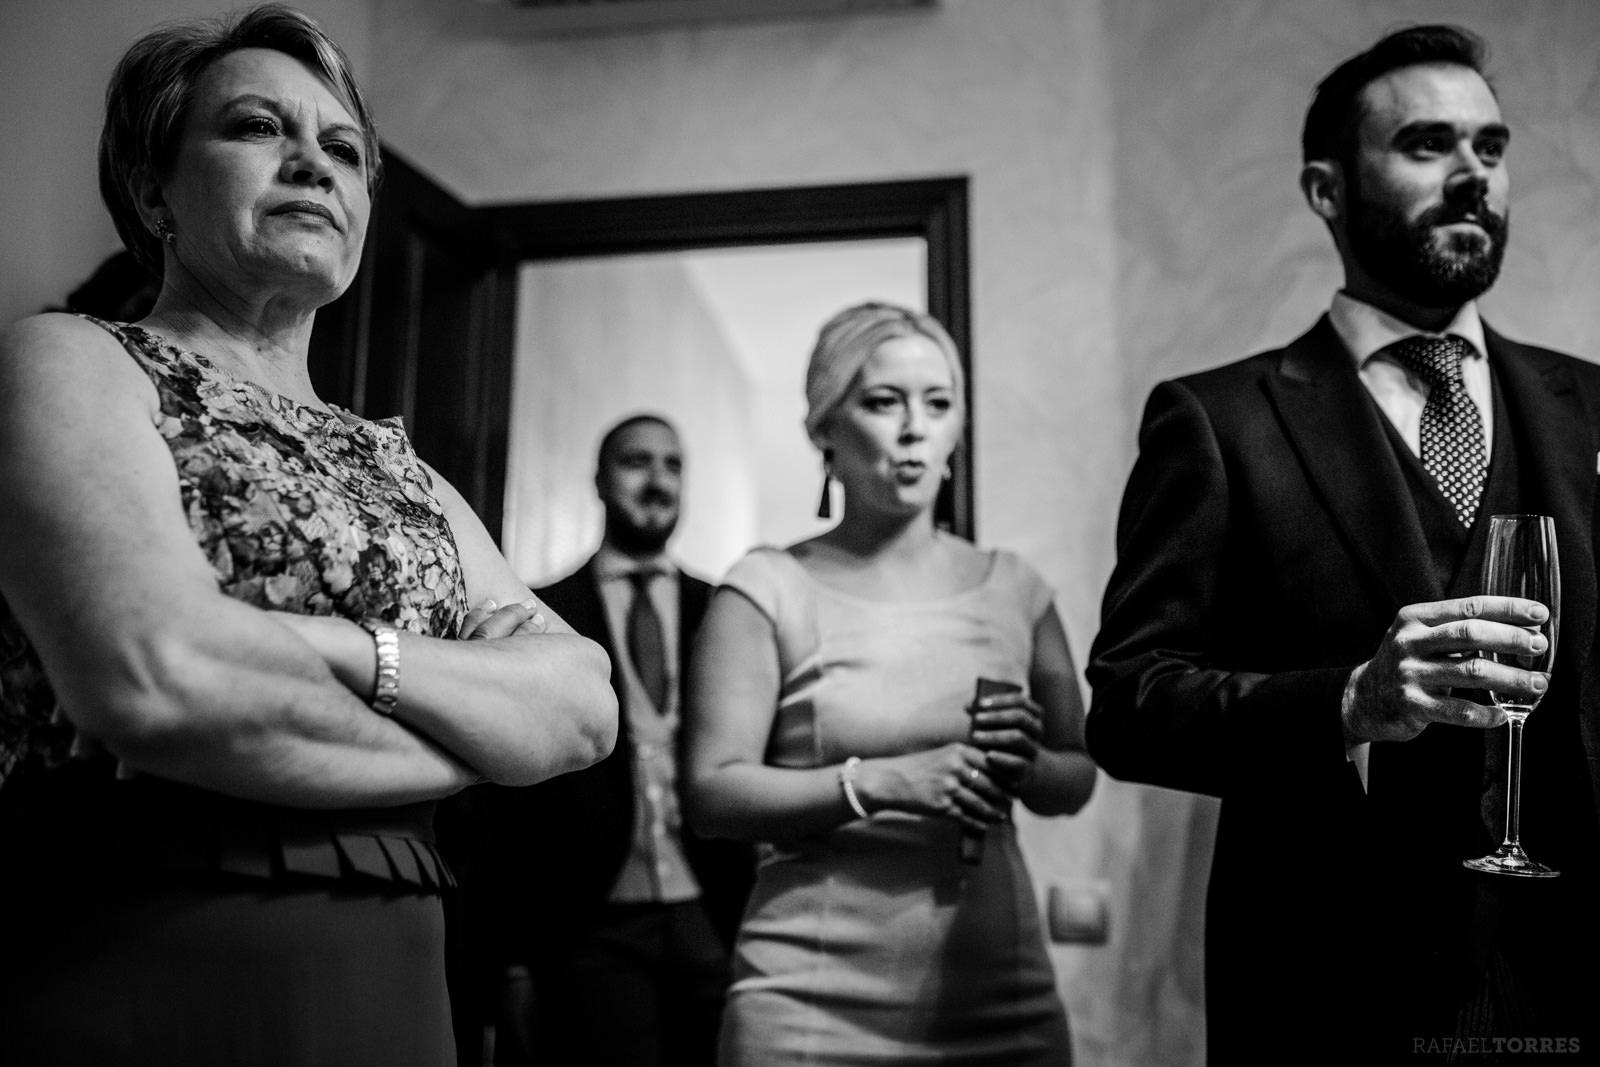 Rafael+Torres+fotografo+bodas+sevilla+madrid+barcelona+wedding+photographer+bodas+diferentes+bodaensevilla+molinillos+fotografo+hacienda+oran+alfonso+wedding+photographer-15.jpg